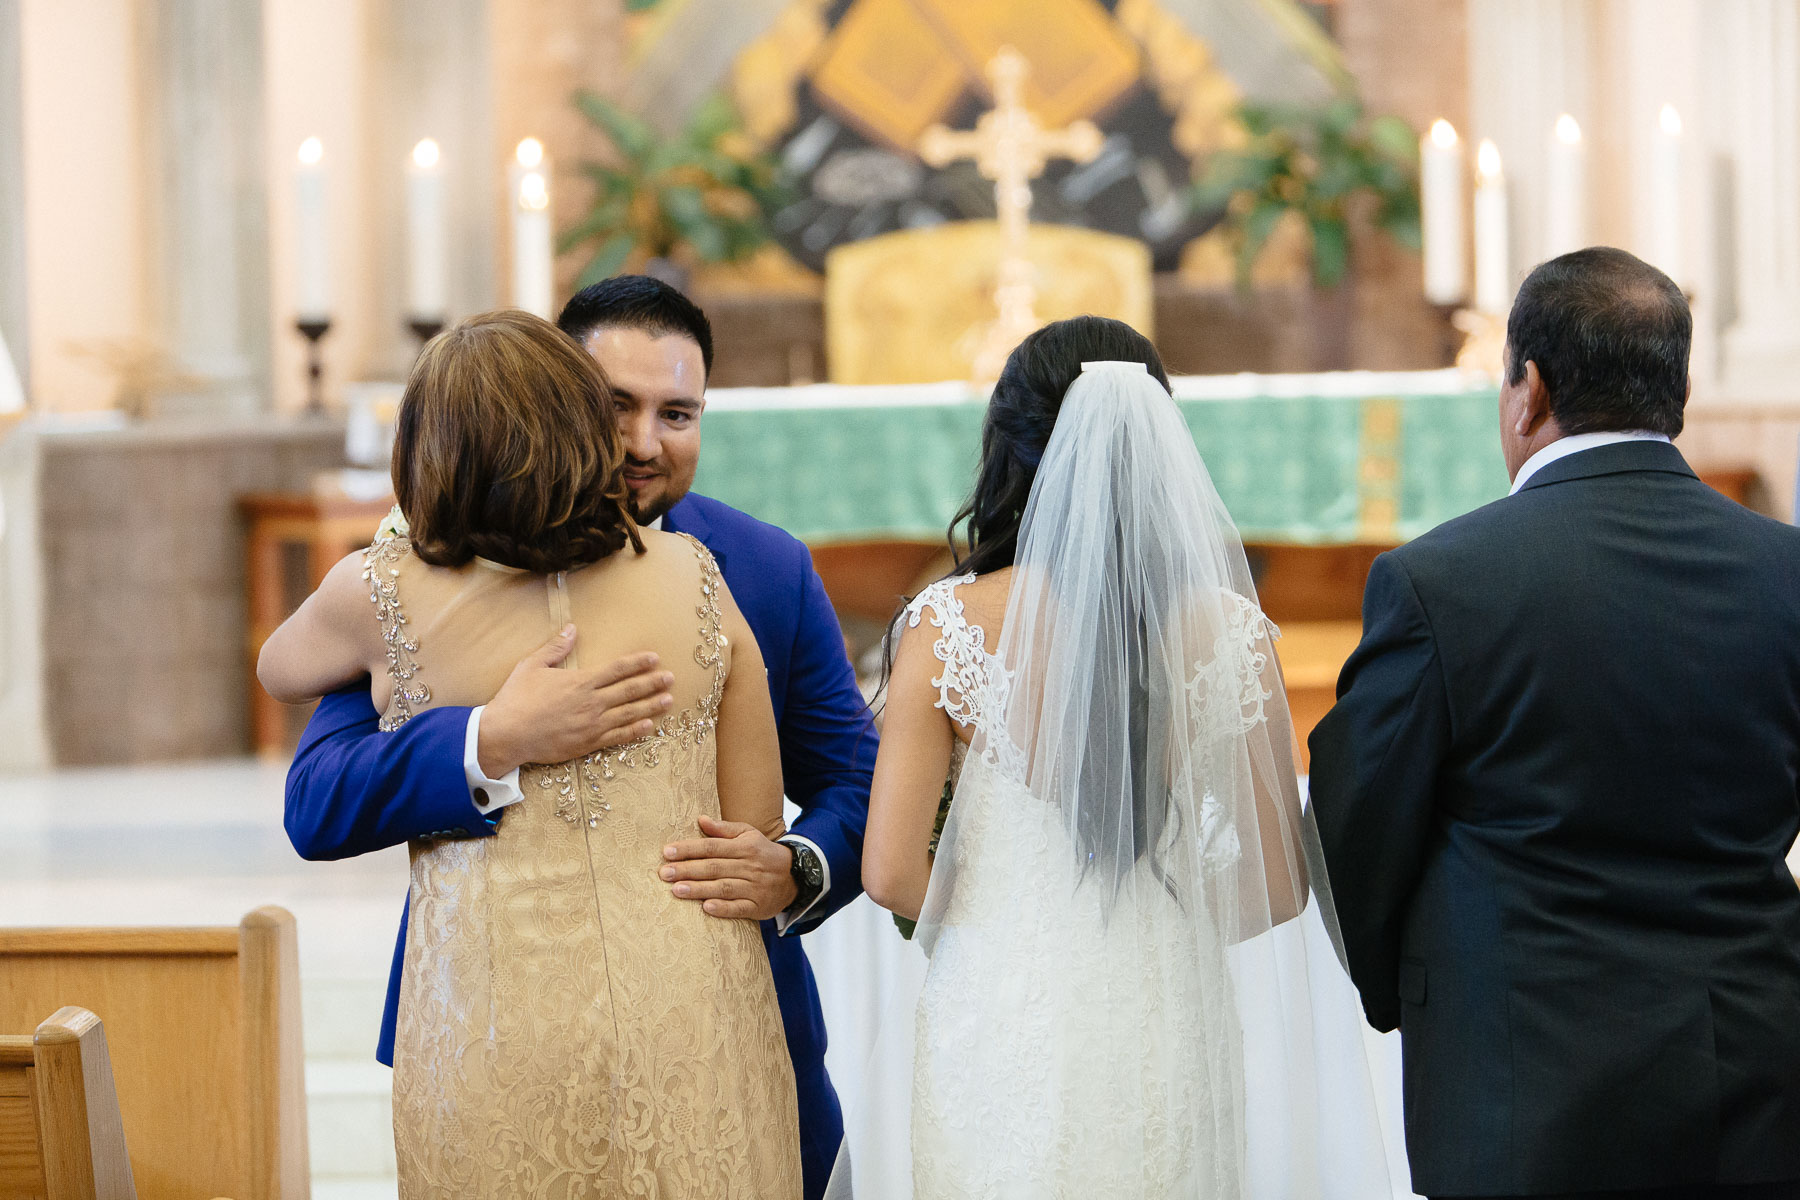 161029-Luxium-Weddings-Arizona-Jeff-Griselda-First-Look-Val-Vista-Lakes-Gilber-033.jpg